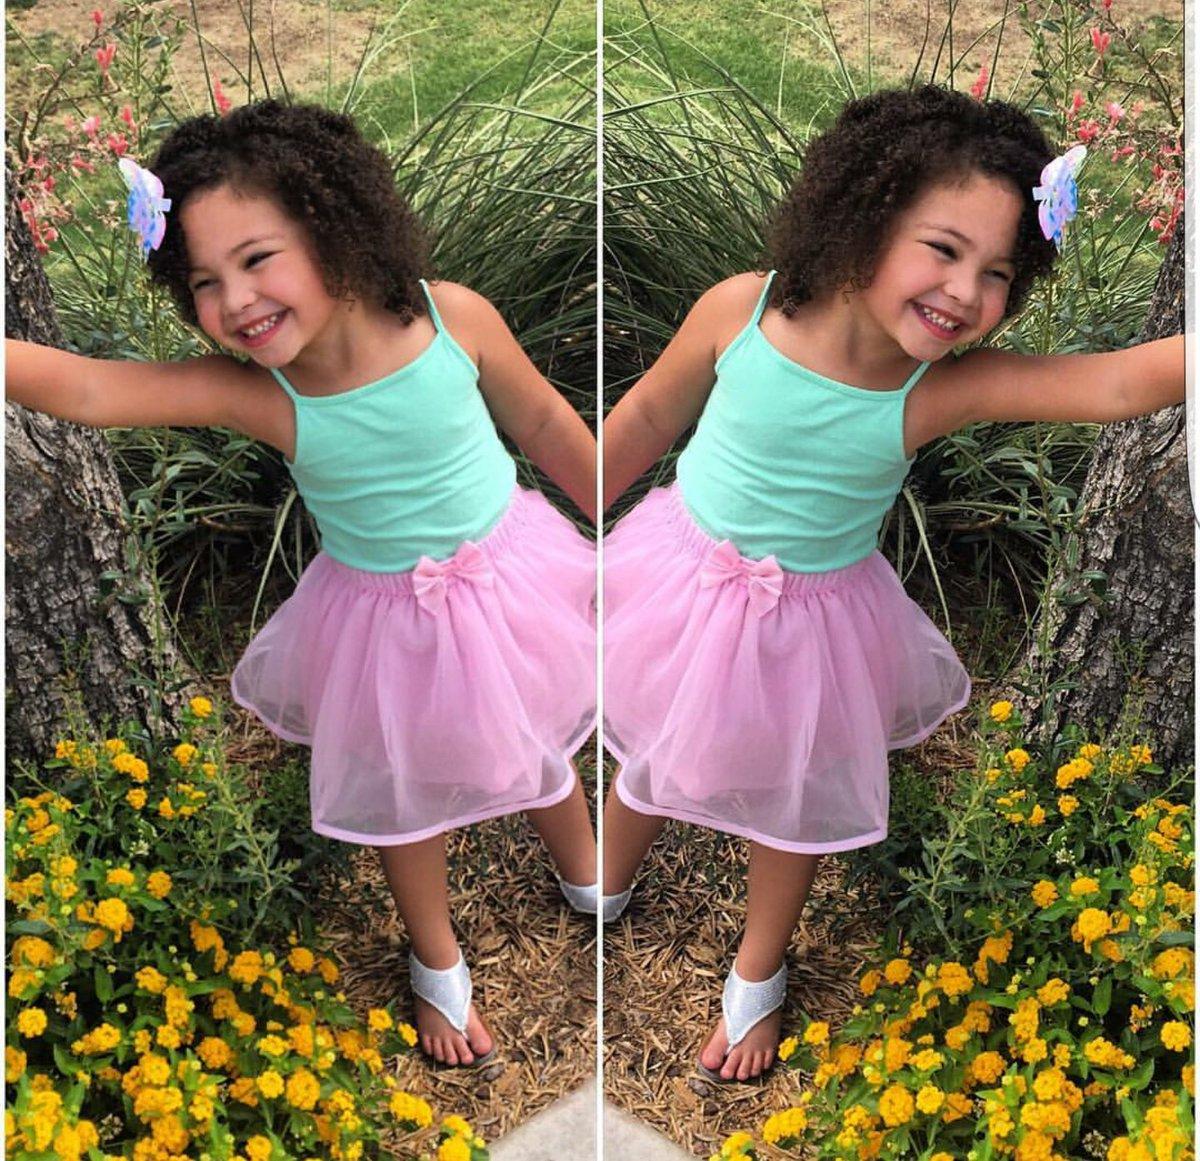 My Princess https://t.co/urx387NFfz